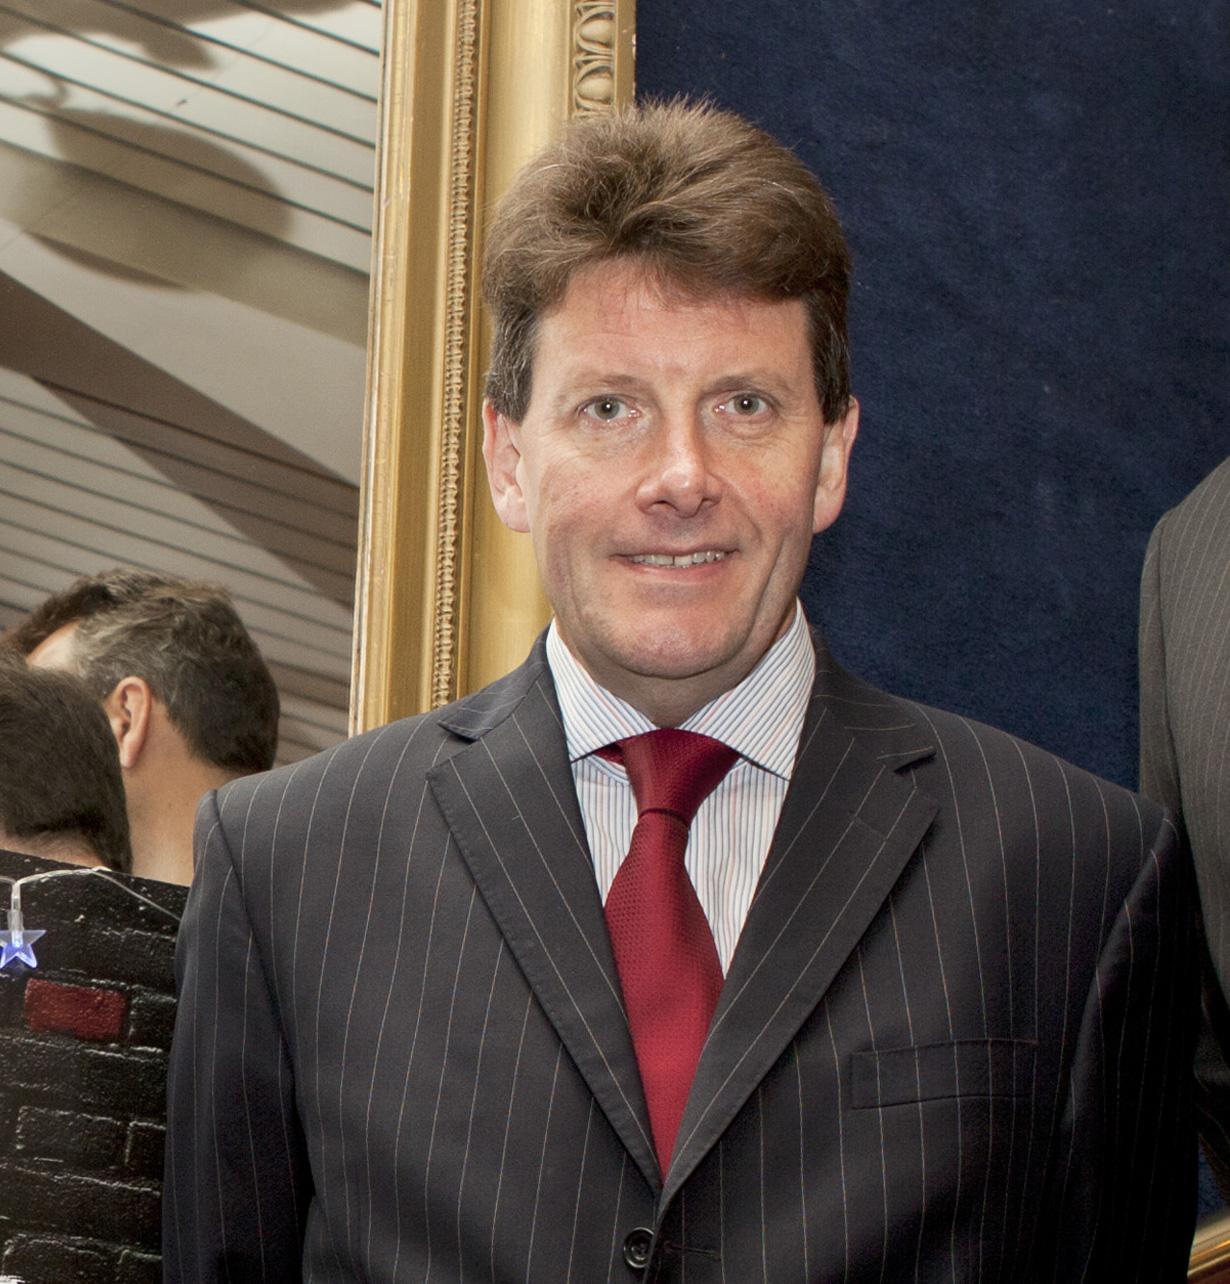 Meat processor Tulip reports £28M loss